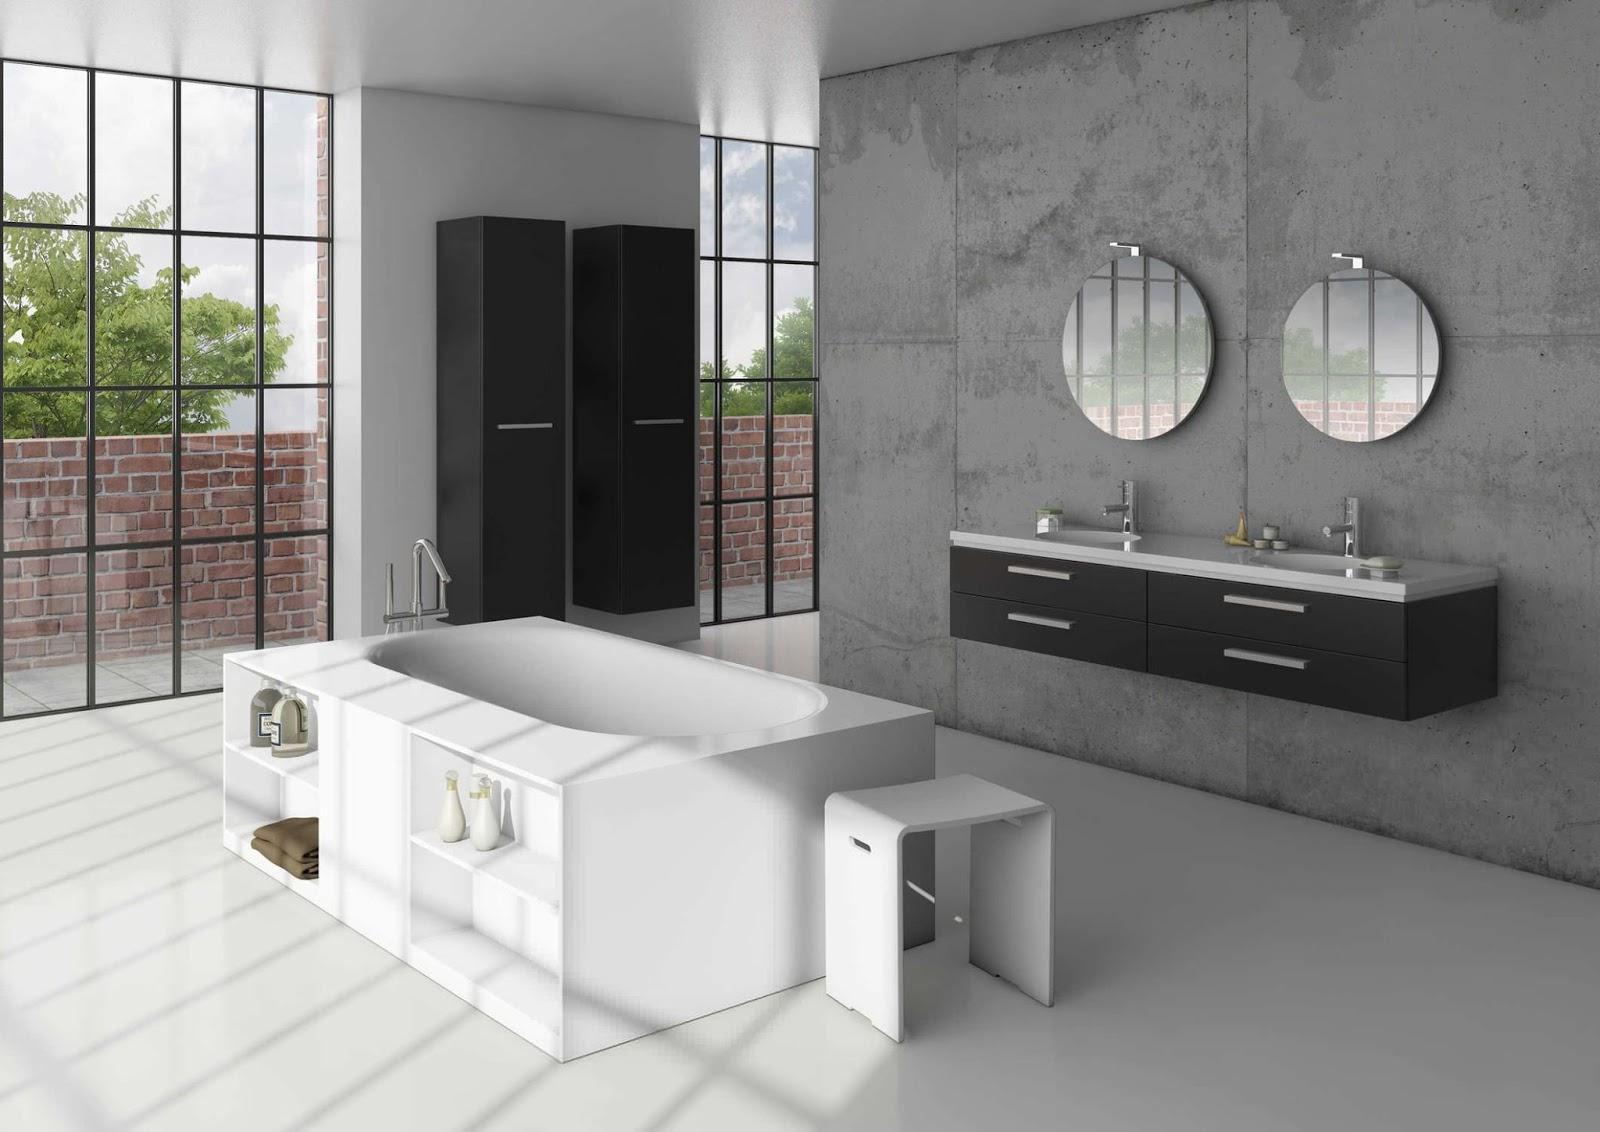 Side street style: modern bathroom inspiration